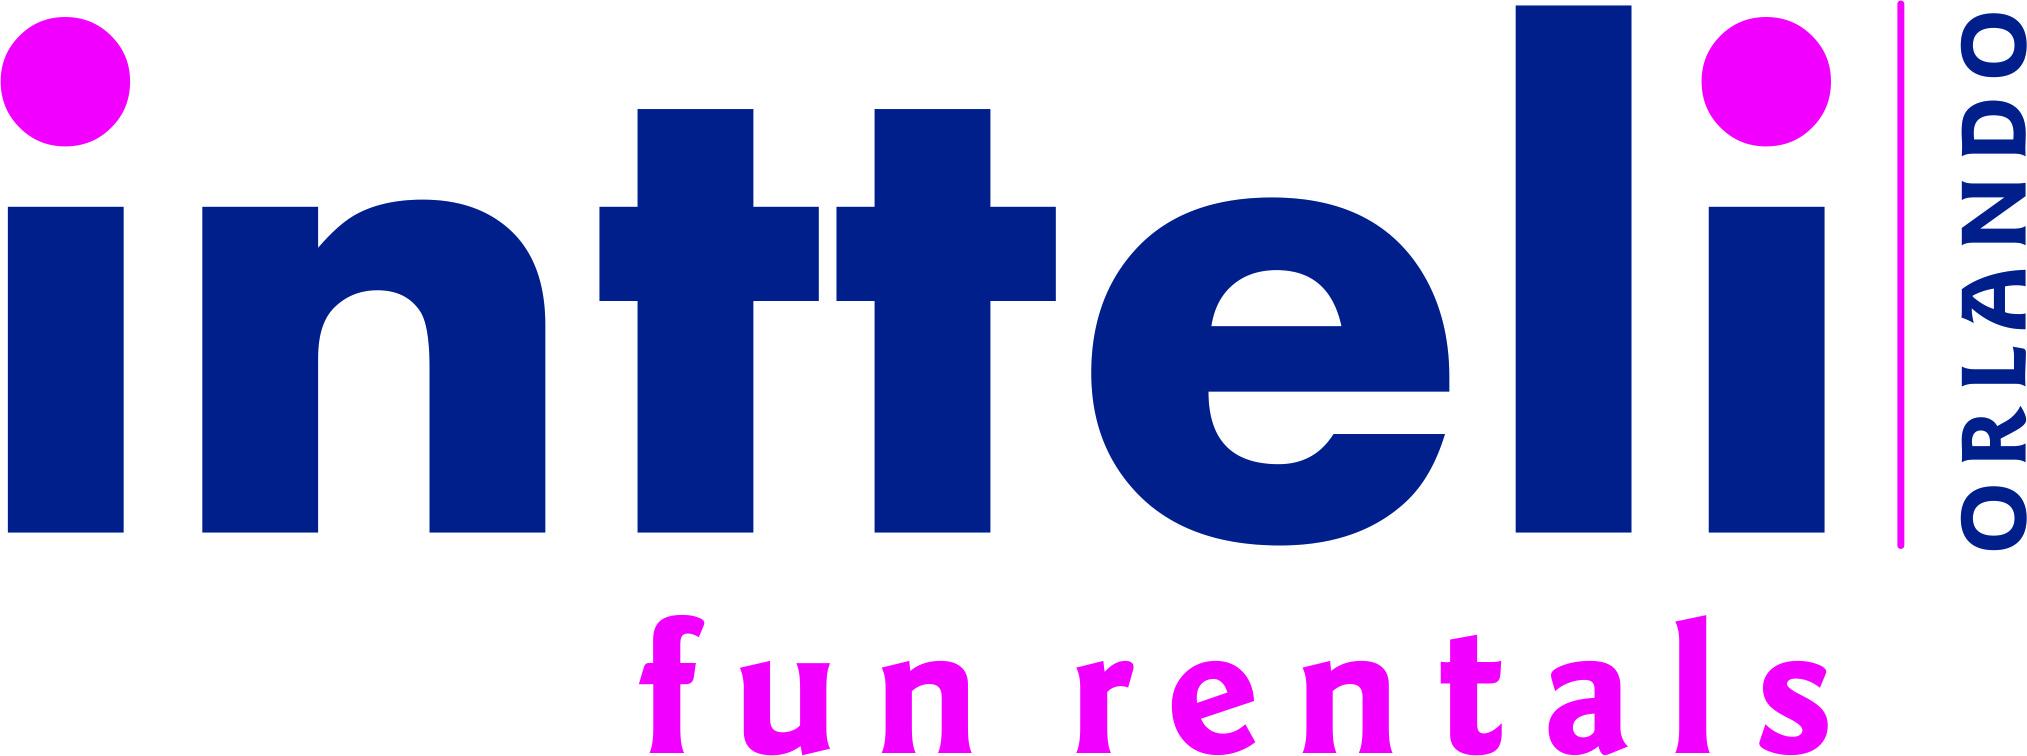 http://investinfloridaevents.com/wp-content/uploads/2018/10/marca-intteli-fun-rental-final.jpg